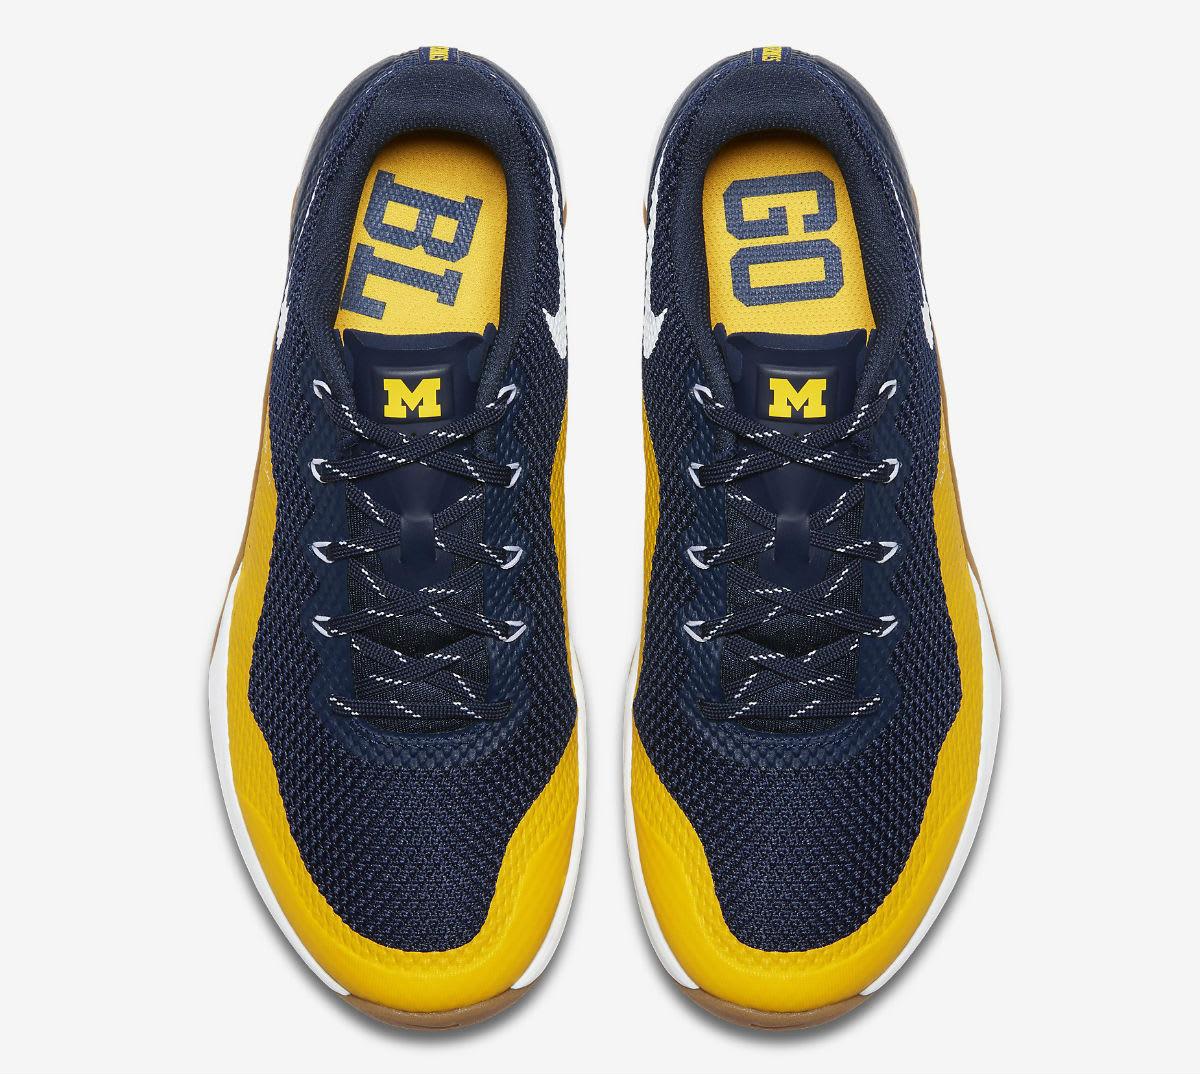 Nike Metcon Repper DSX Michigan Release Date (2)